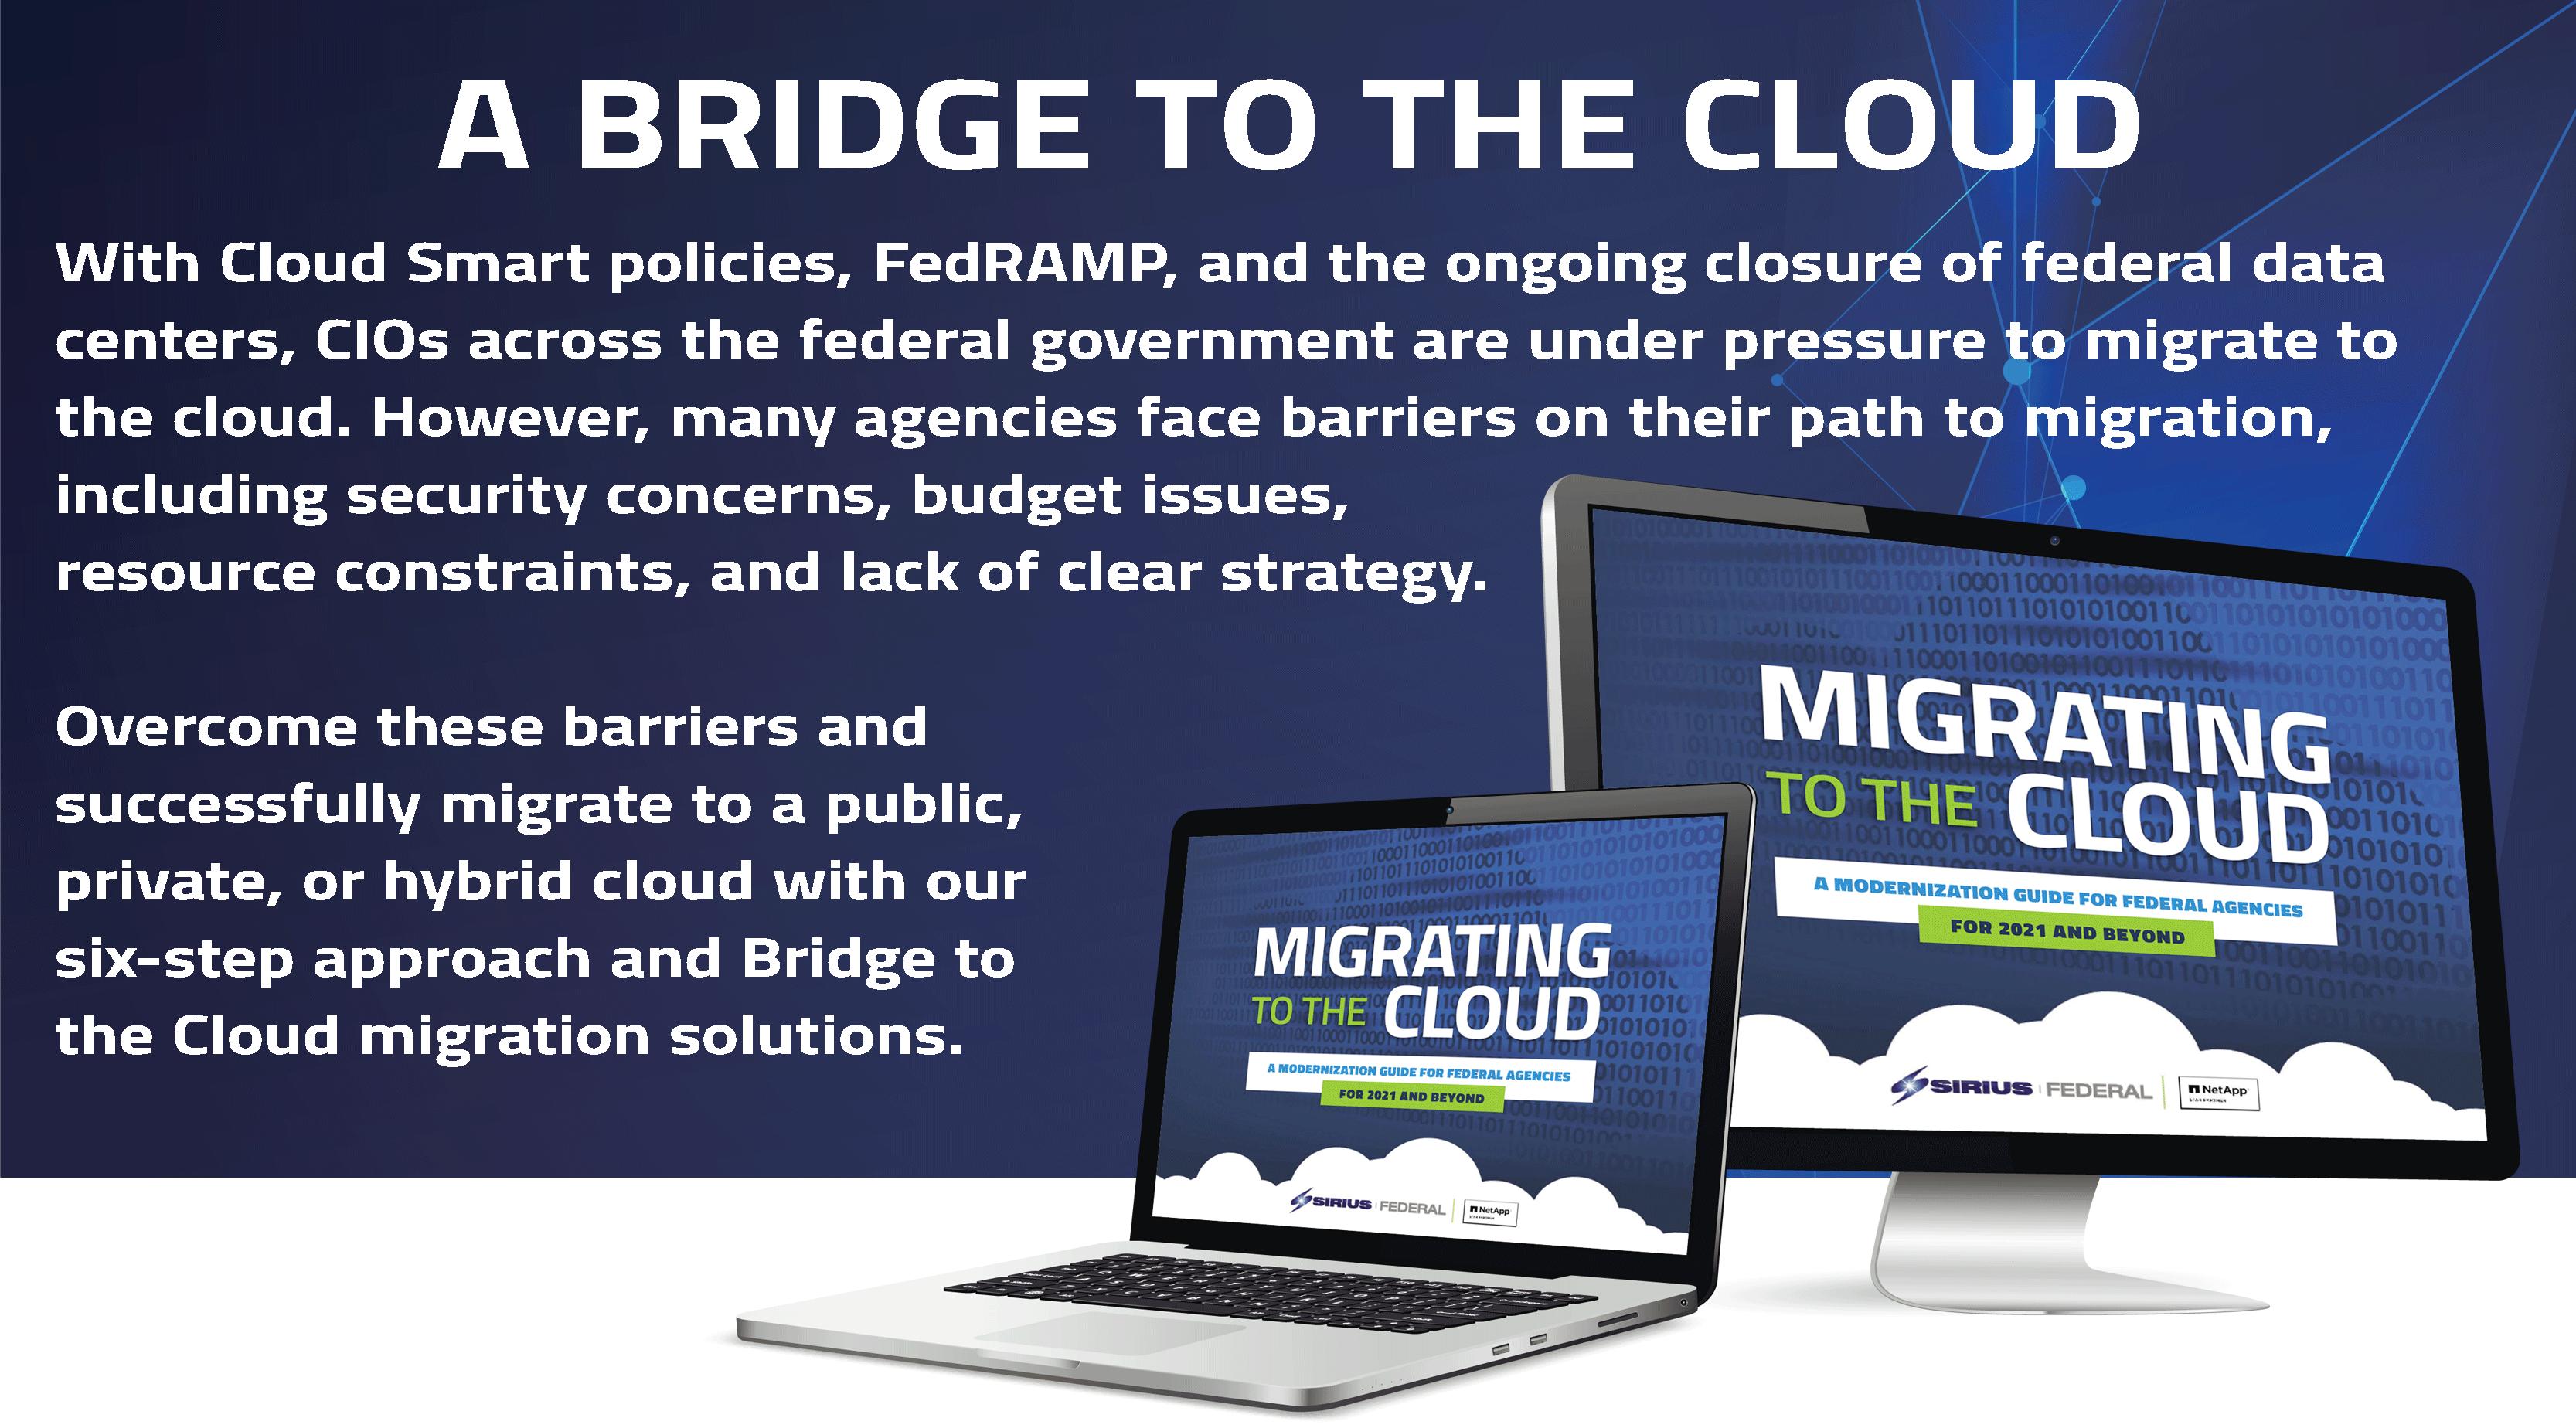 A Bridge to the Cloud